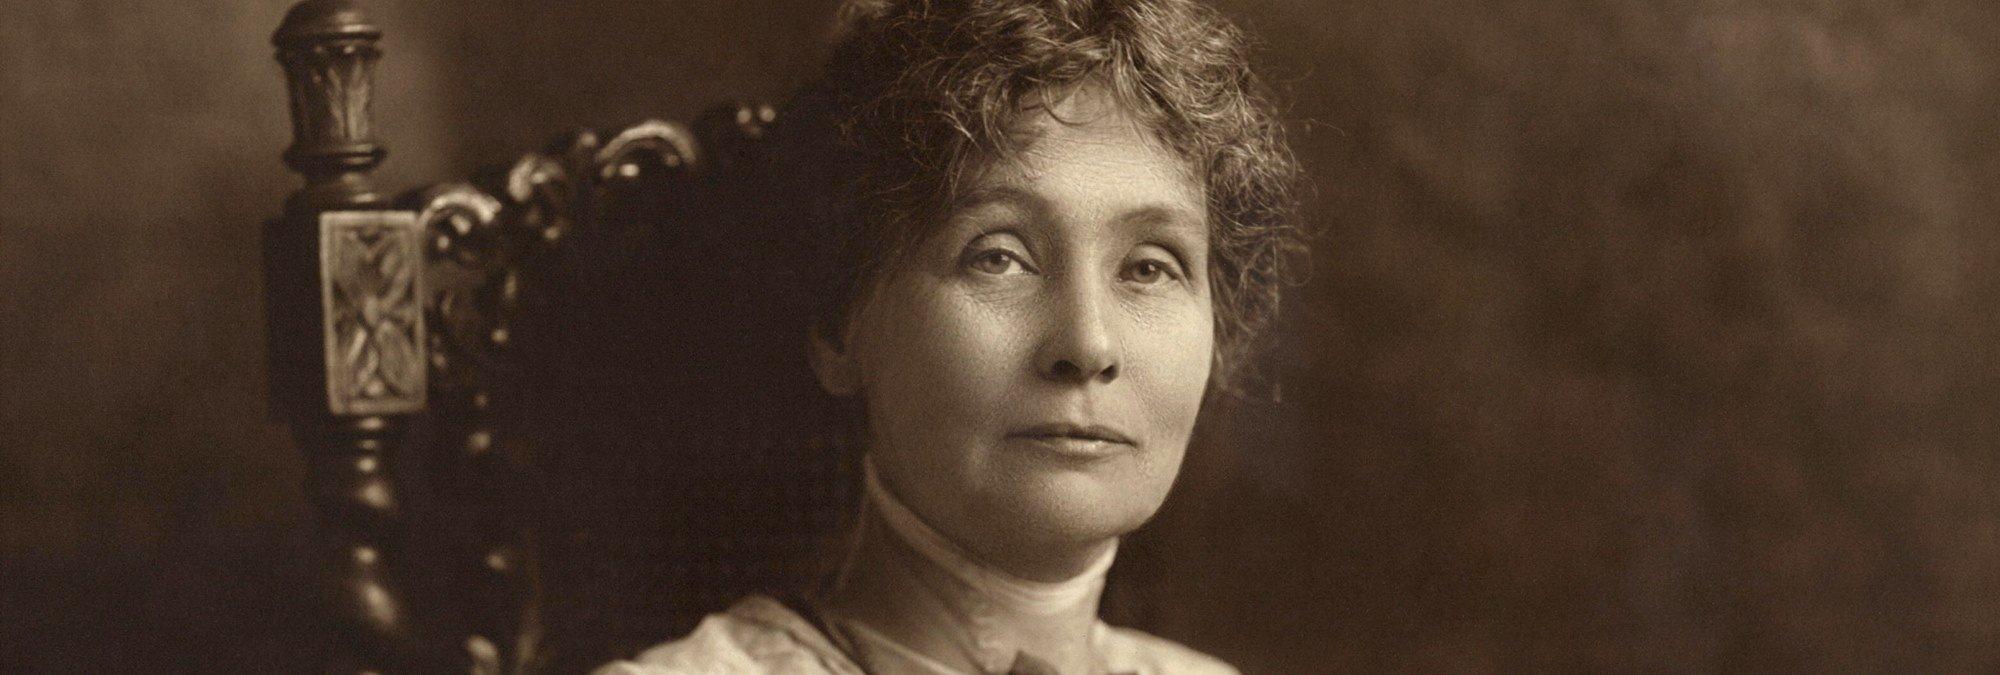 Resultado de imagen para emmeline pankhurst husband